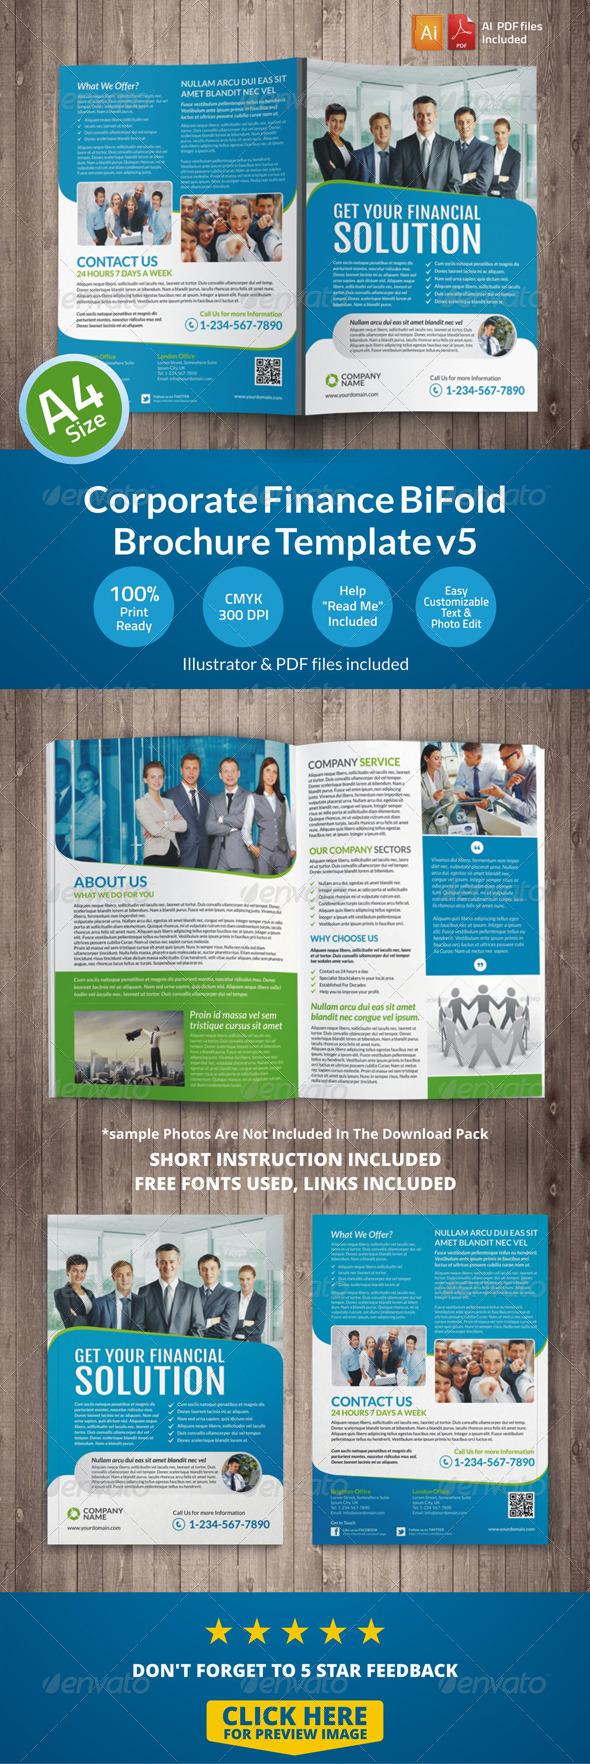 Corporate Finance BiFold Brochure Template v5 - Corporate Brochures